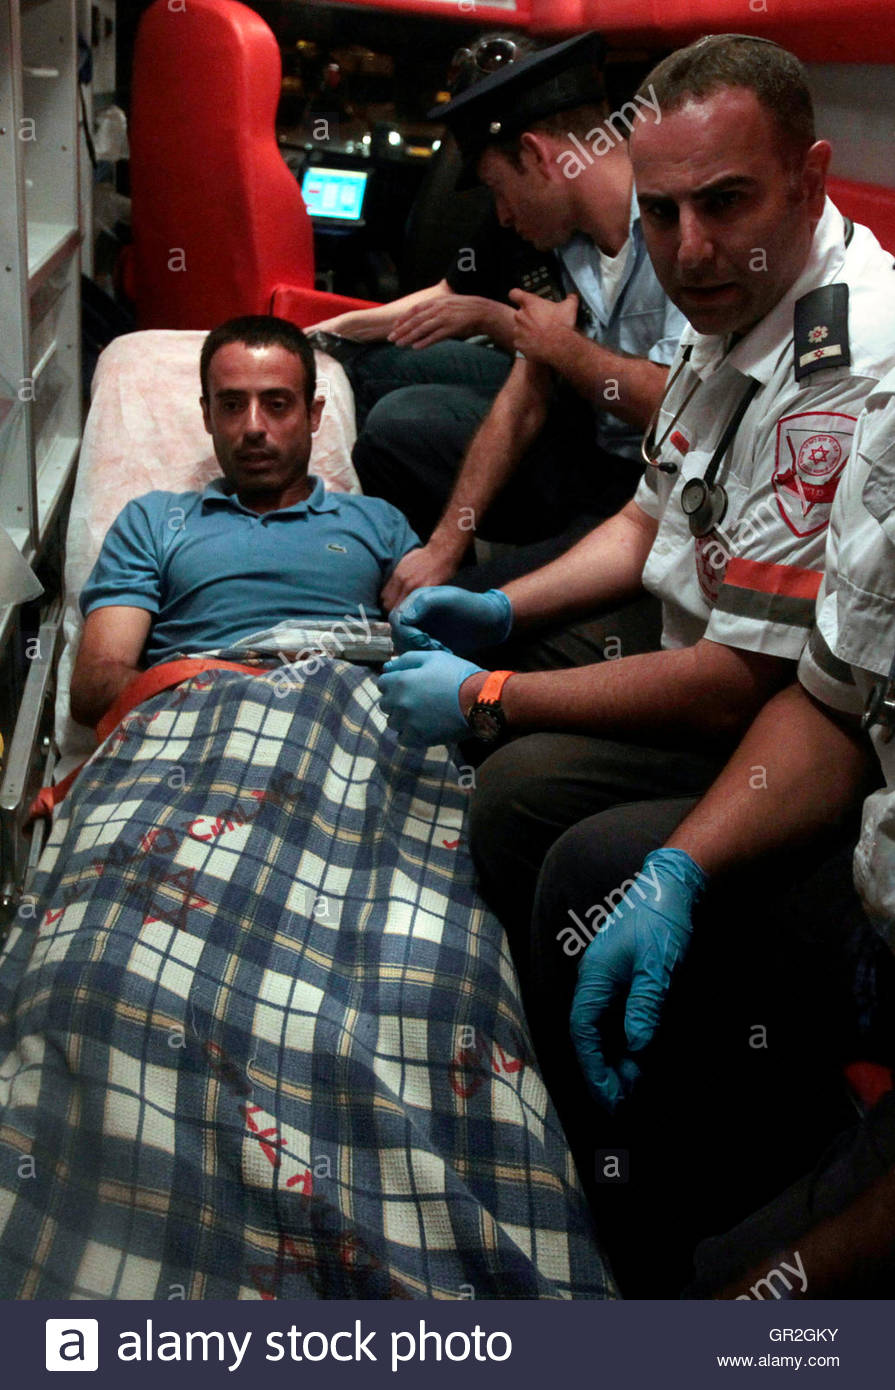 an i medic r sits beside nadim injas l inside an an i medic r sits beside nadim injas l inside an ambulance in tel aviv before injas is evacuated to hospital 17 2010